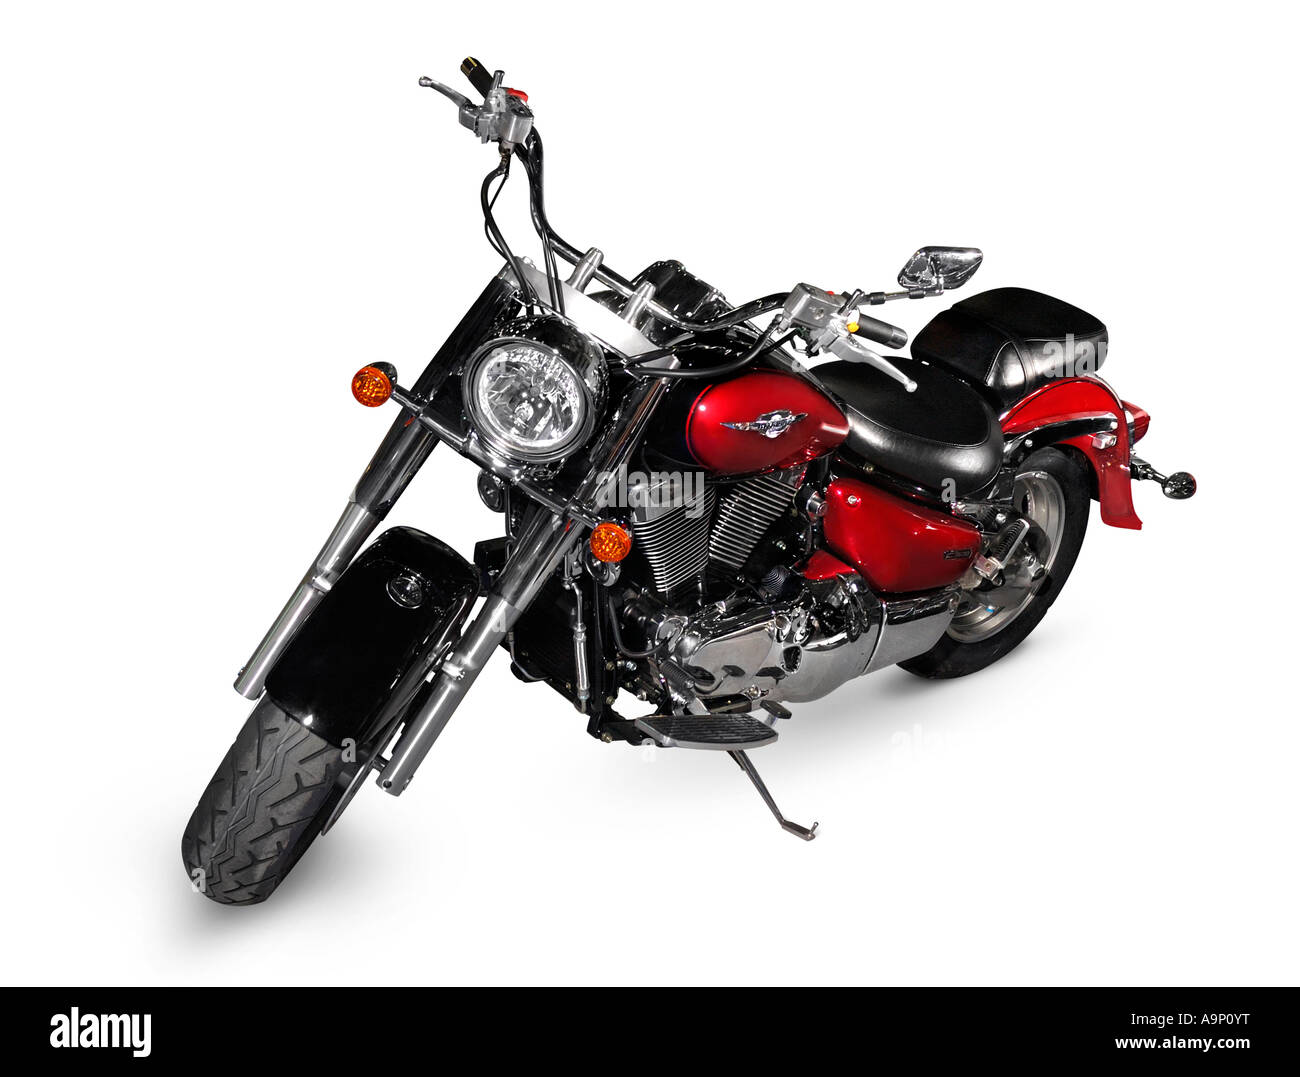 Red motorcycle Suzuki Intruder 1500 motorbike bike Isolated over white cutout - Stock Image